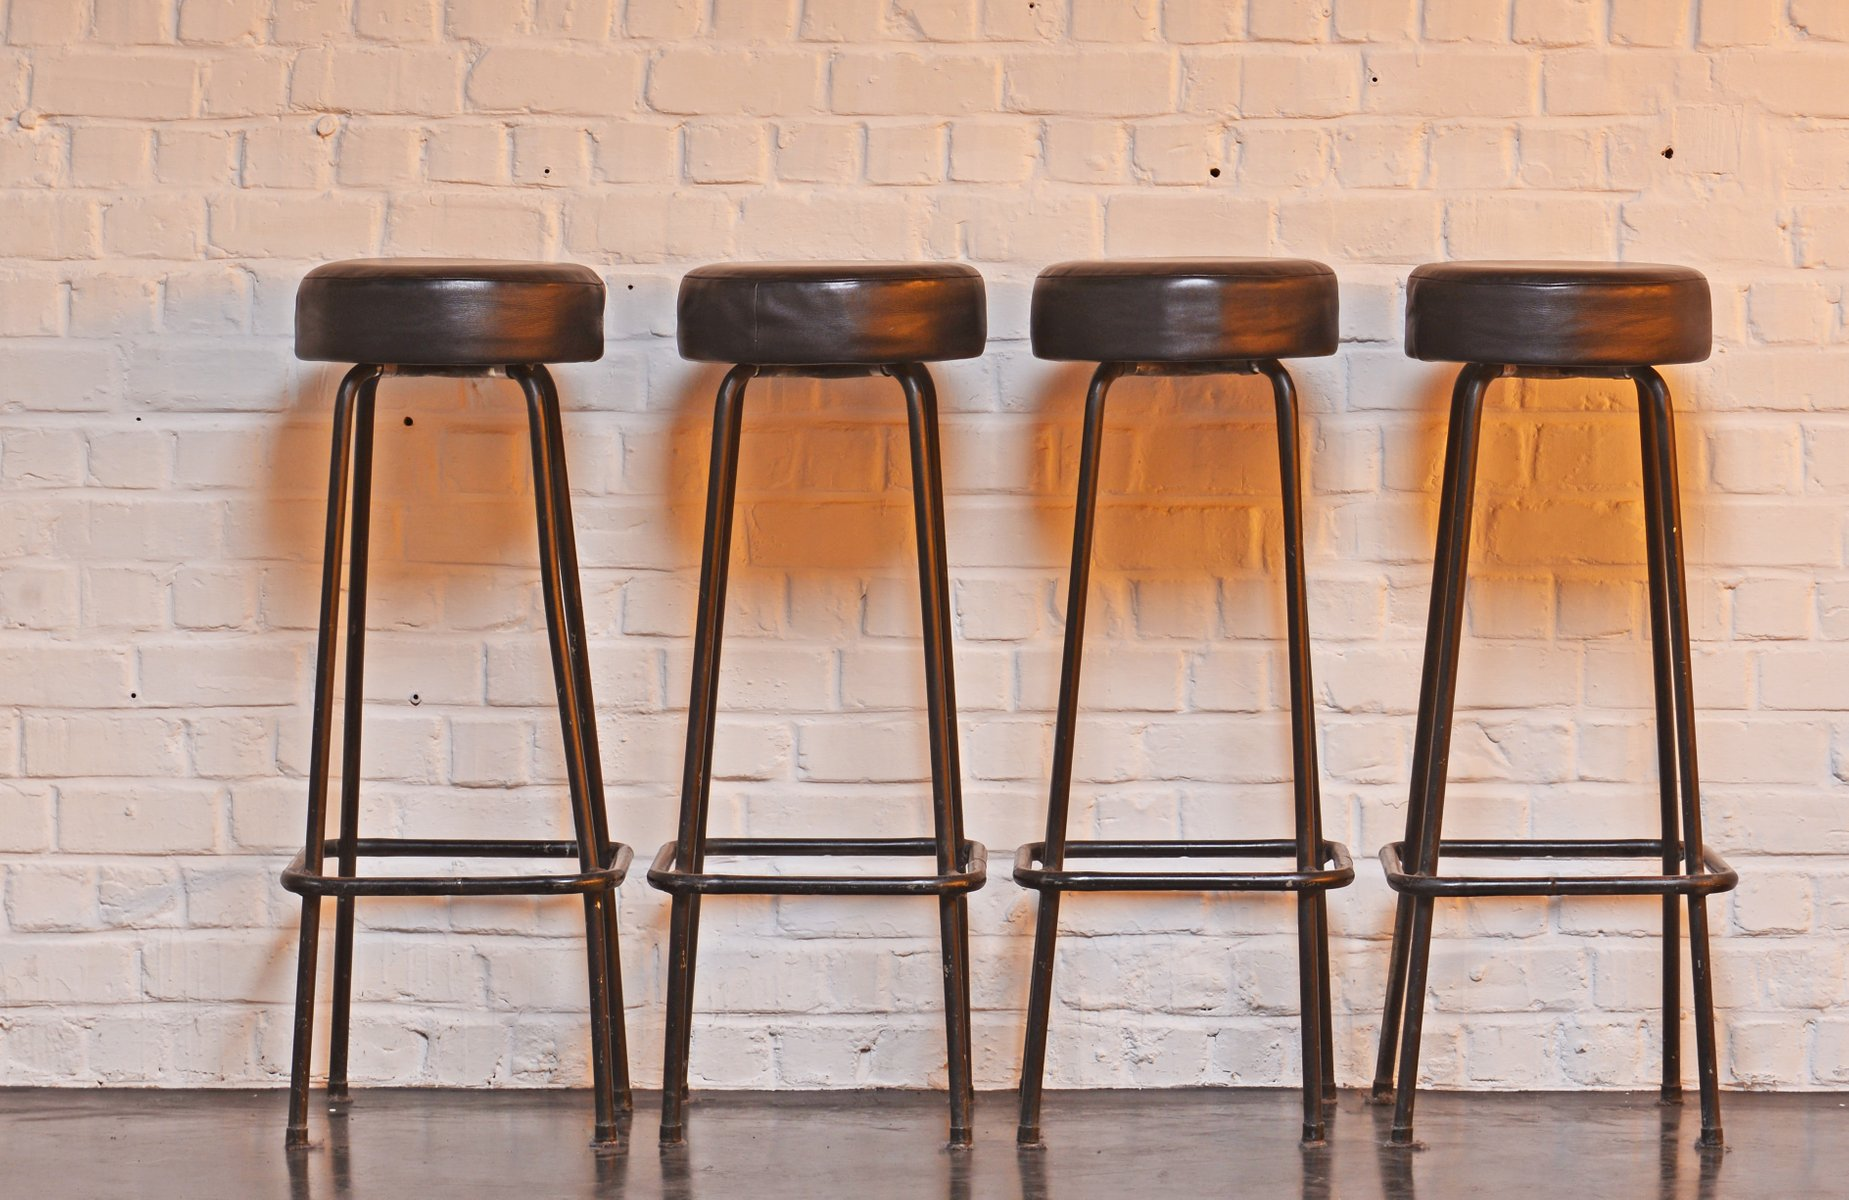 Excellent Mid Century Industrial Bar Stools 1950S Set Of 4 Inzonedesignstudio Interior Chair Design Inzonedesignstudiocom